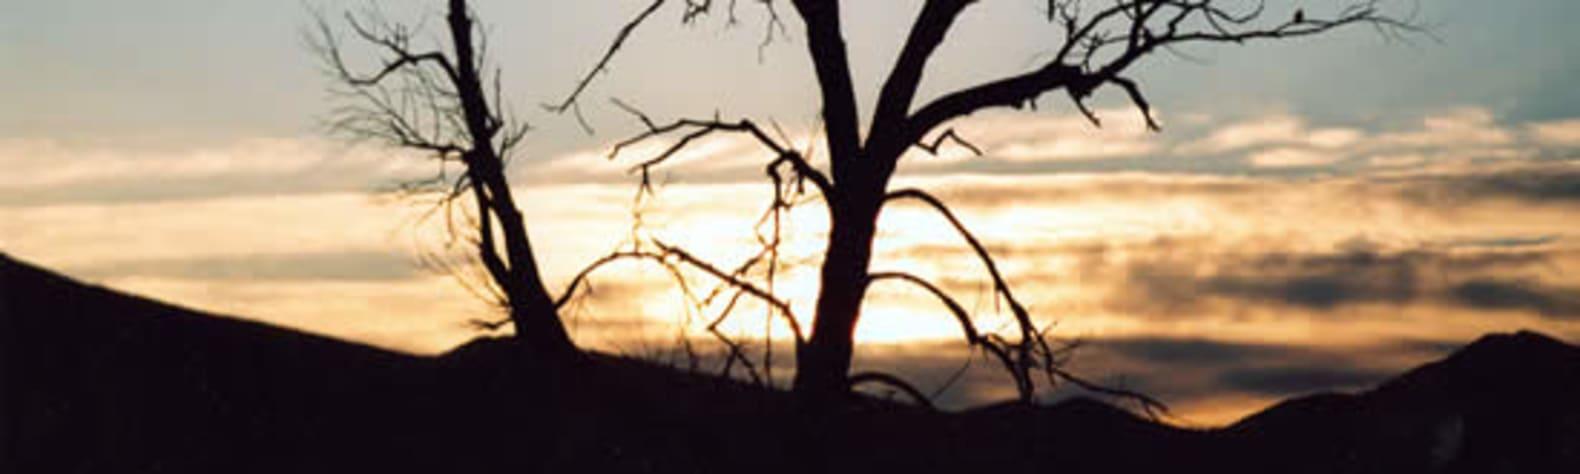 Curlew National Grassland